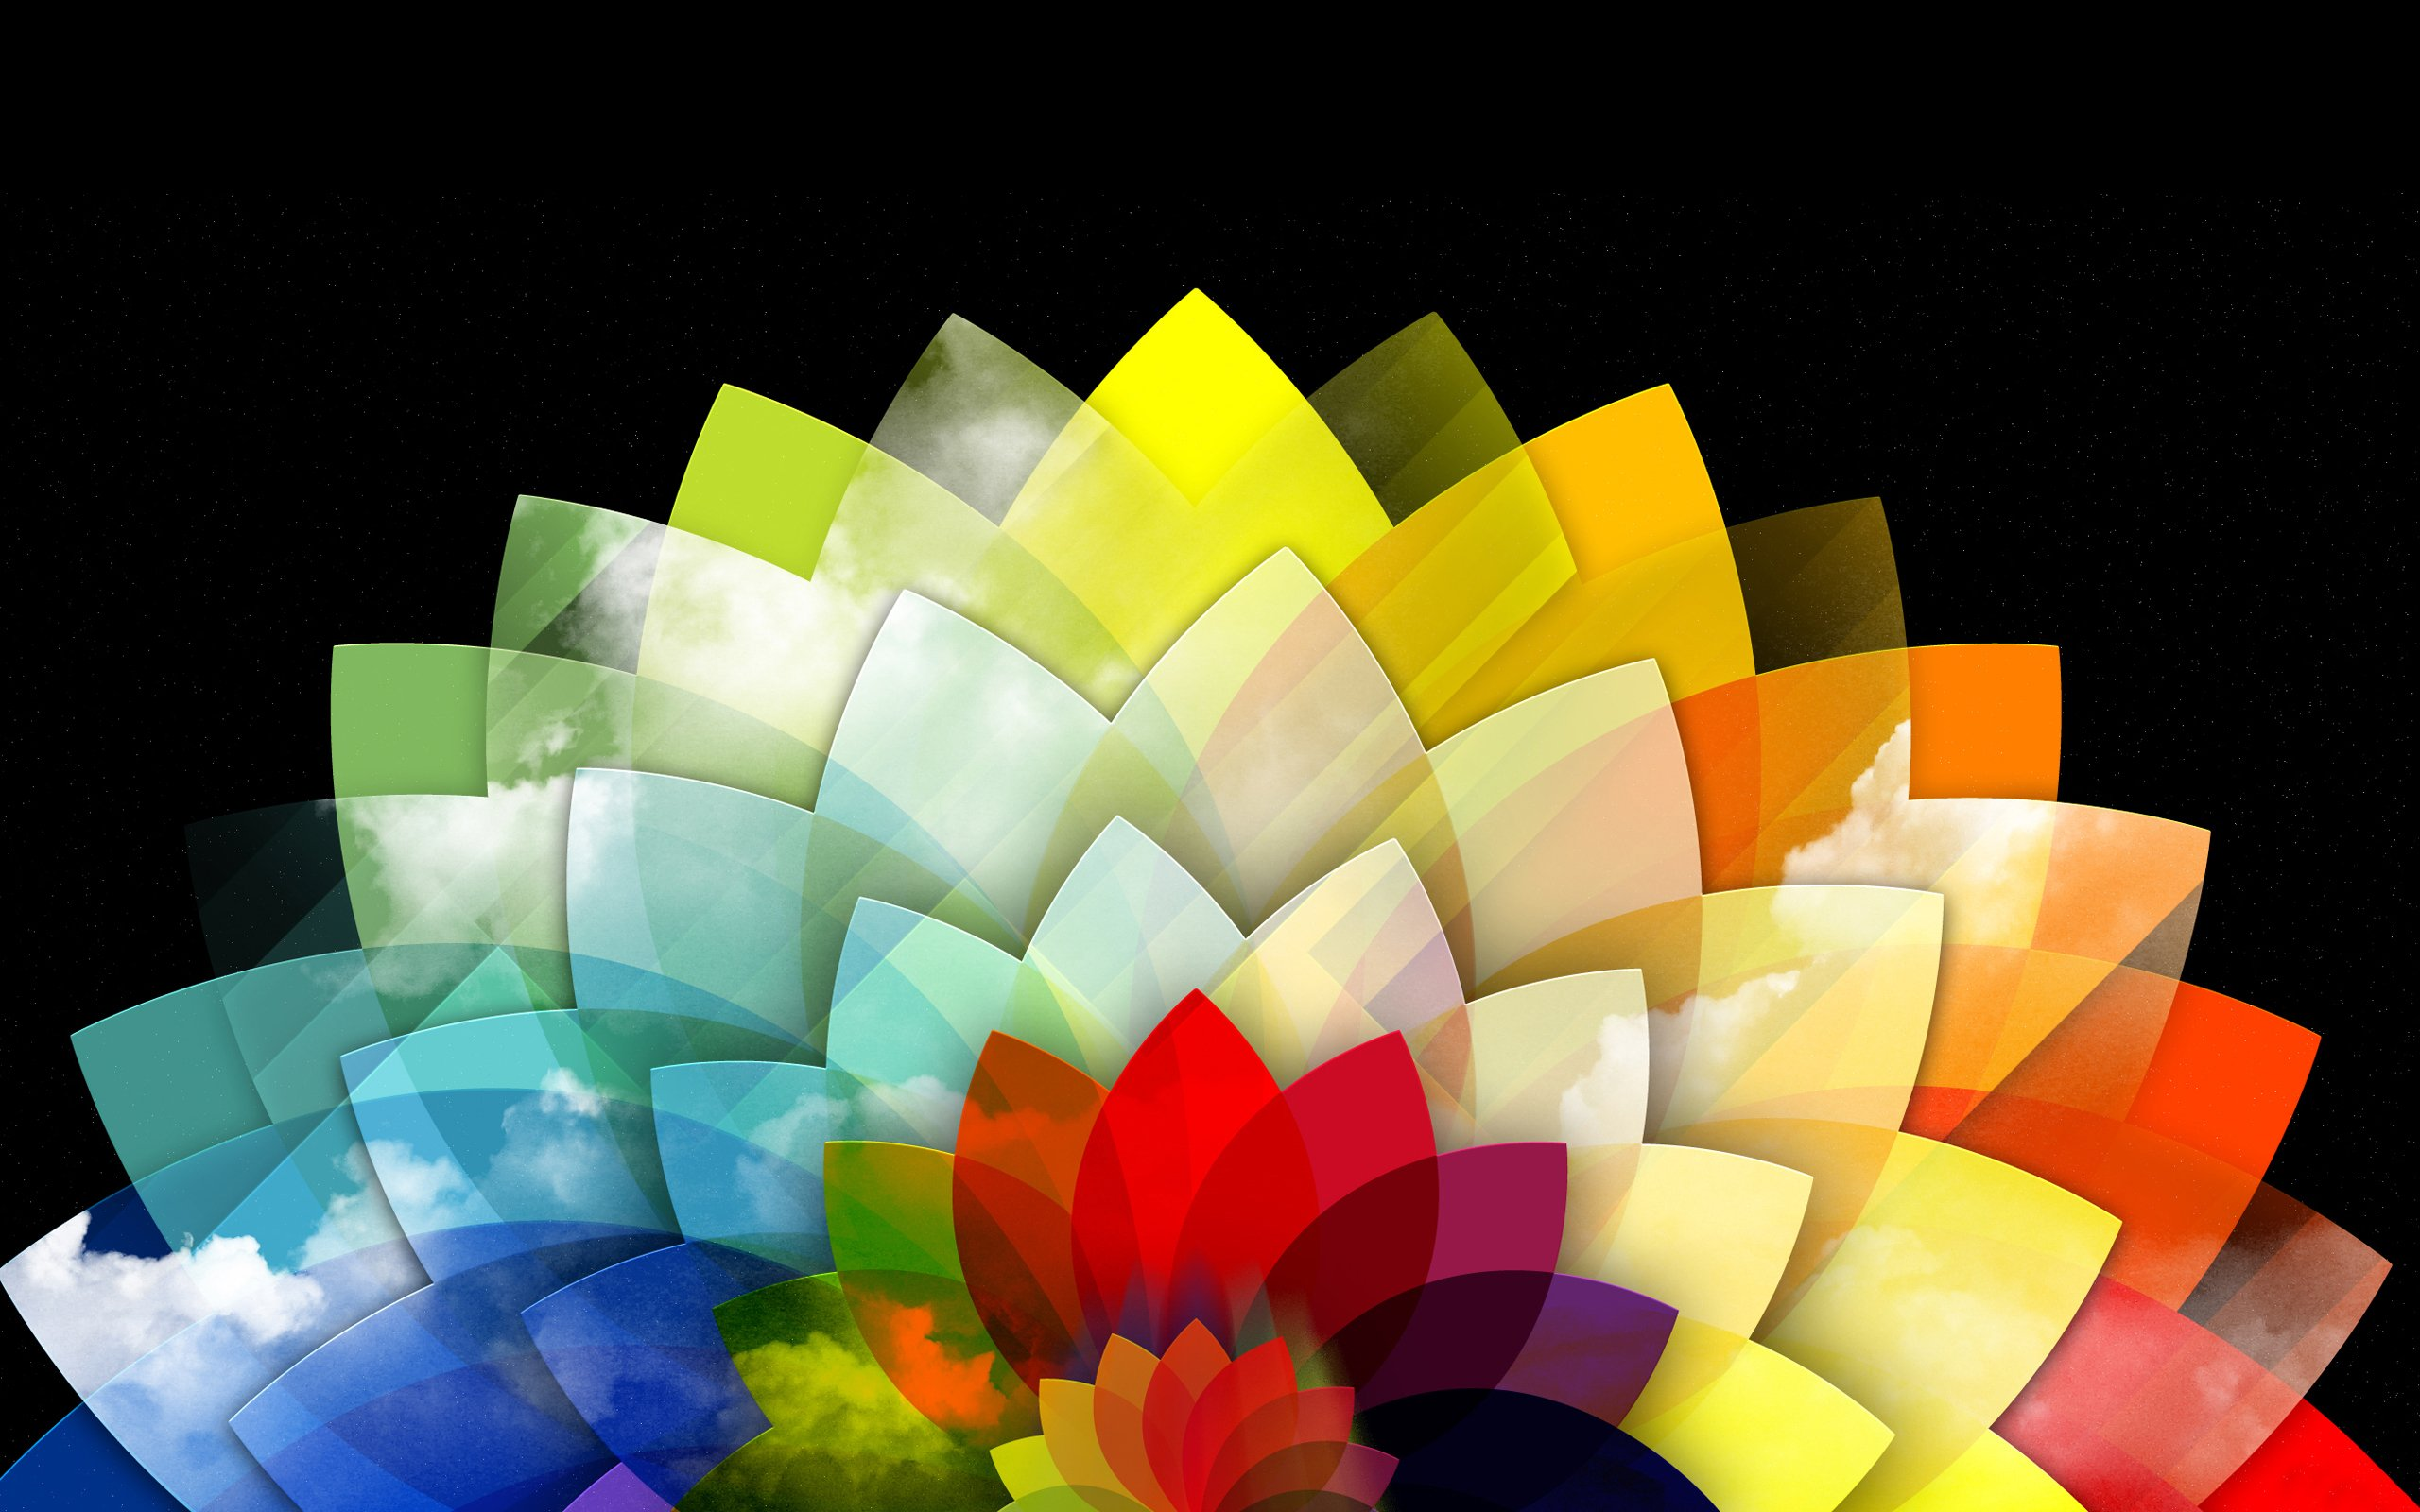 High Resolution Wallpapers Abstract 2560x1600 Download Hd Wallpaper Wallpapertip